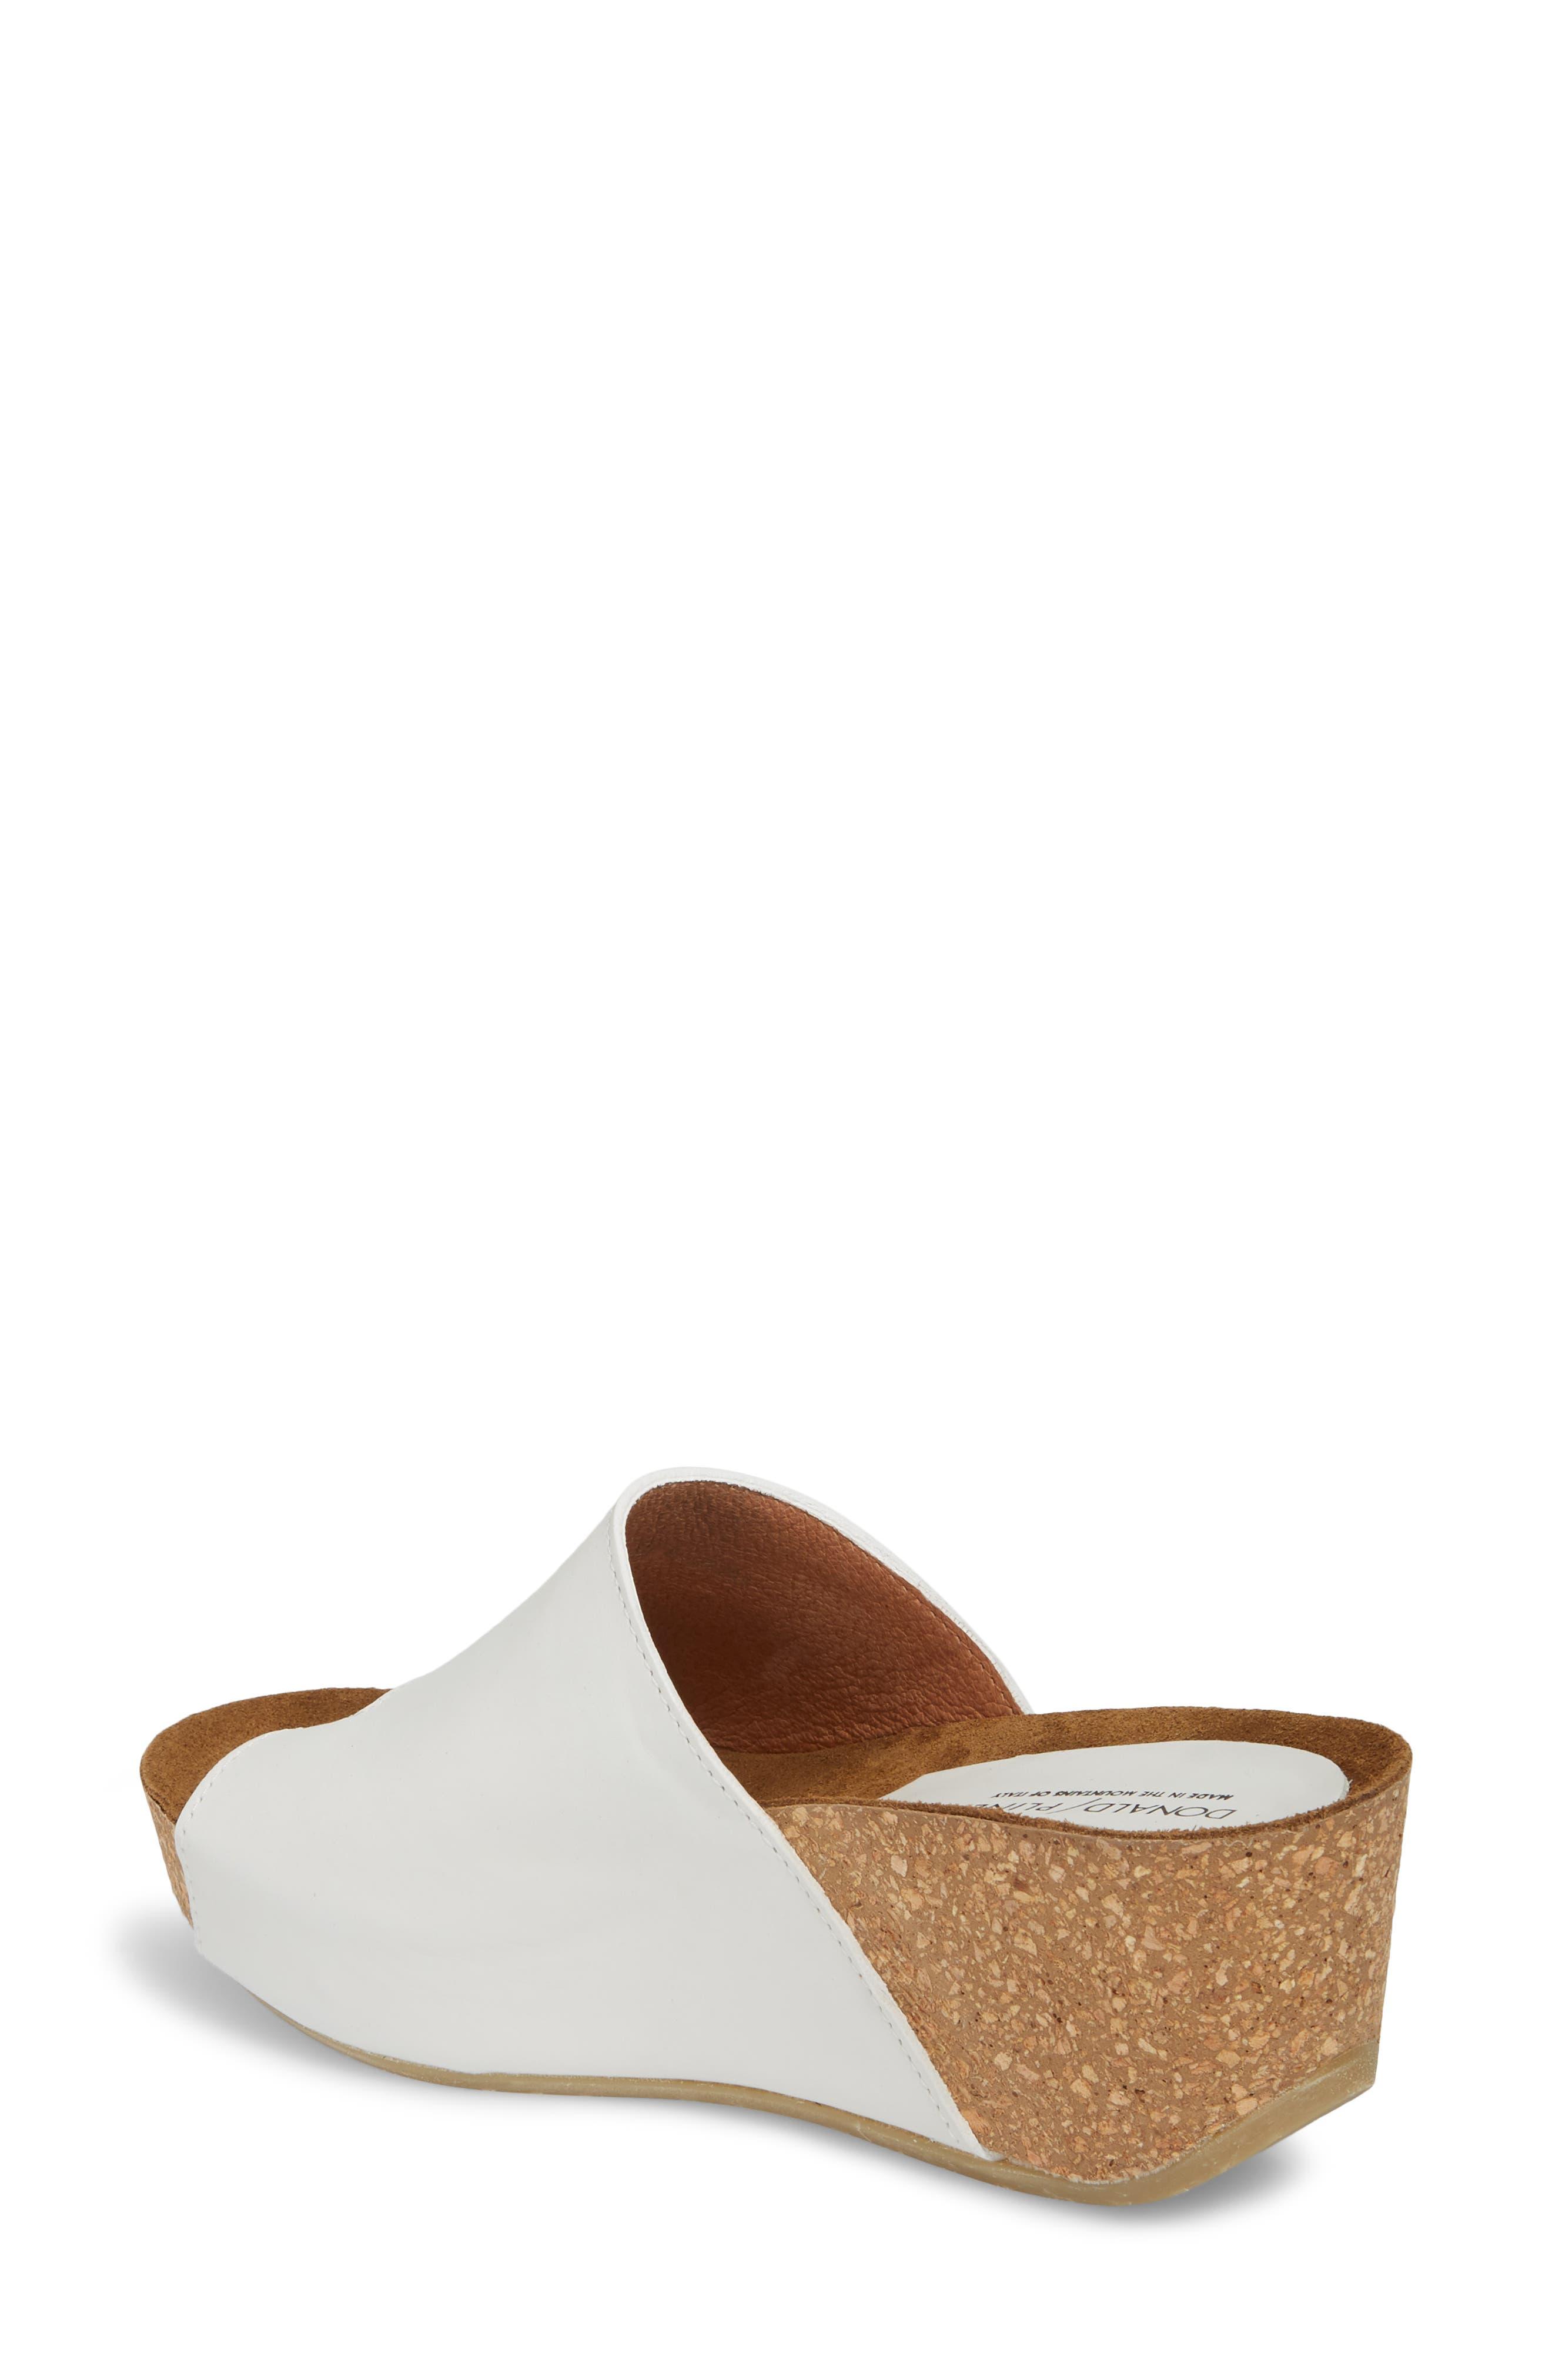 Donald J Pliner Ginie Platform Wedge Sandal,                             Alternate thumbnail 2, color,                             Bone Leather